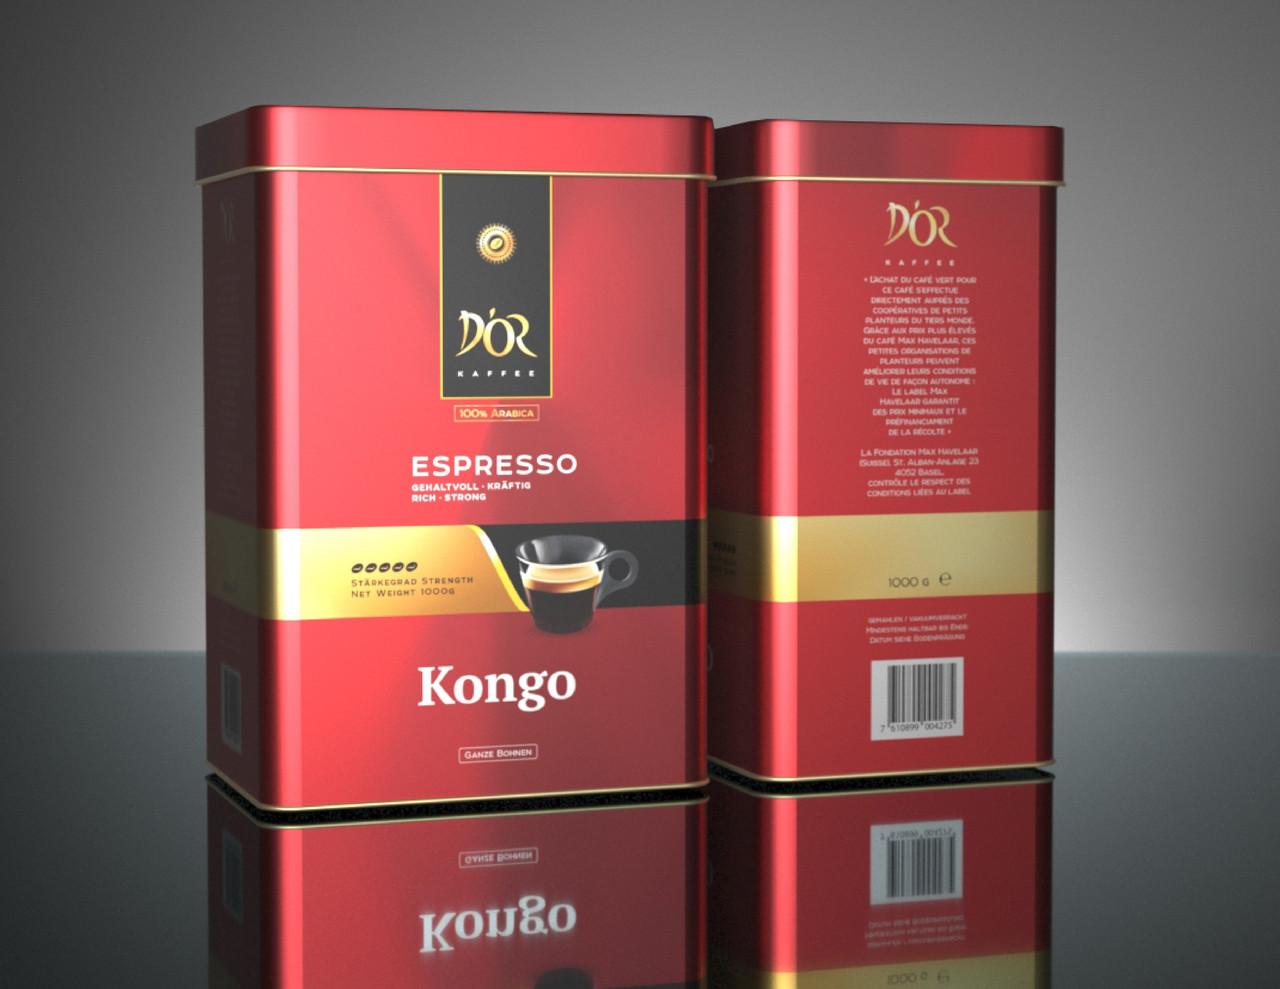 DOR Espresso Kongo 1 кг. зерно